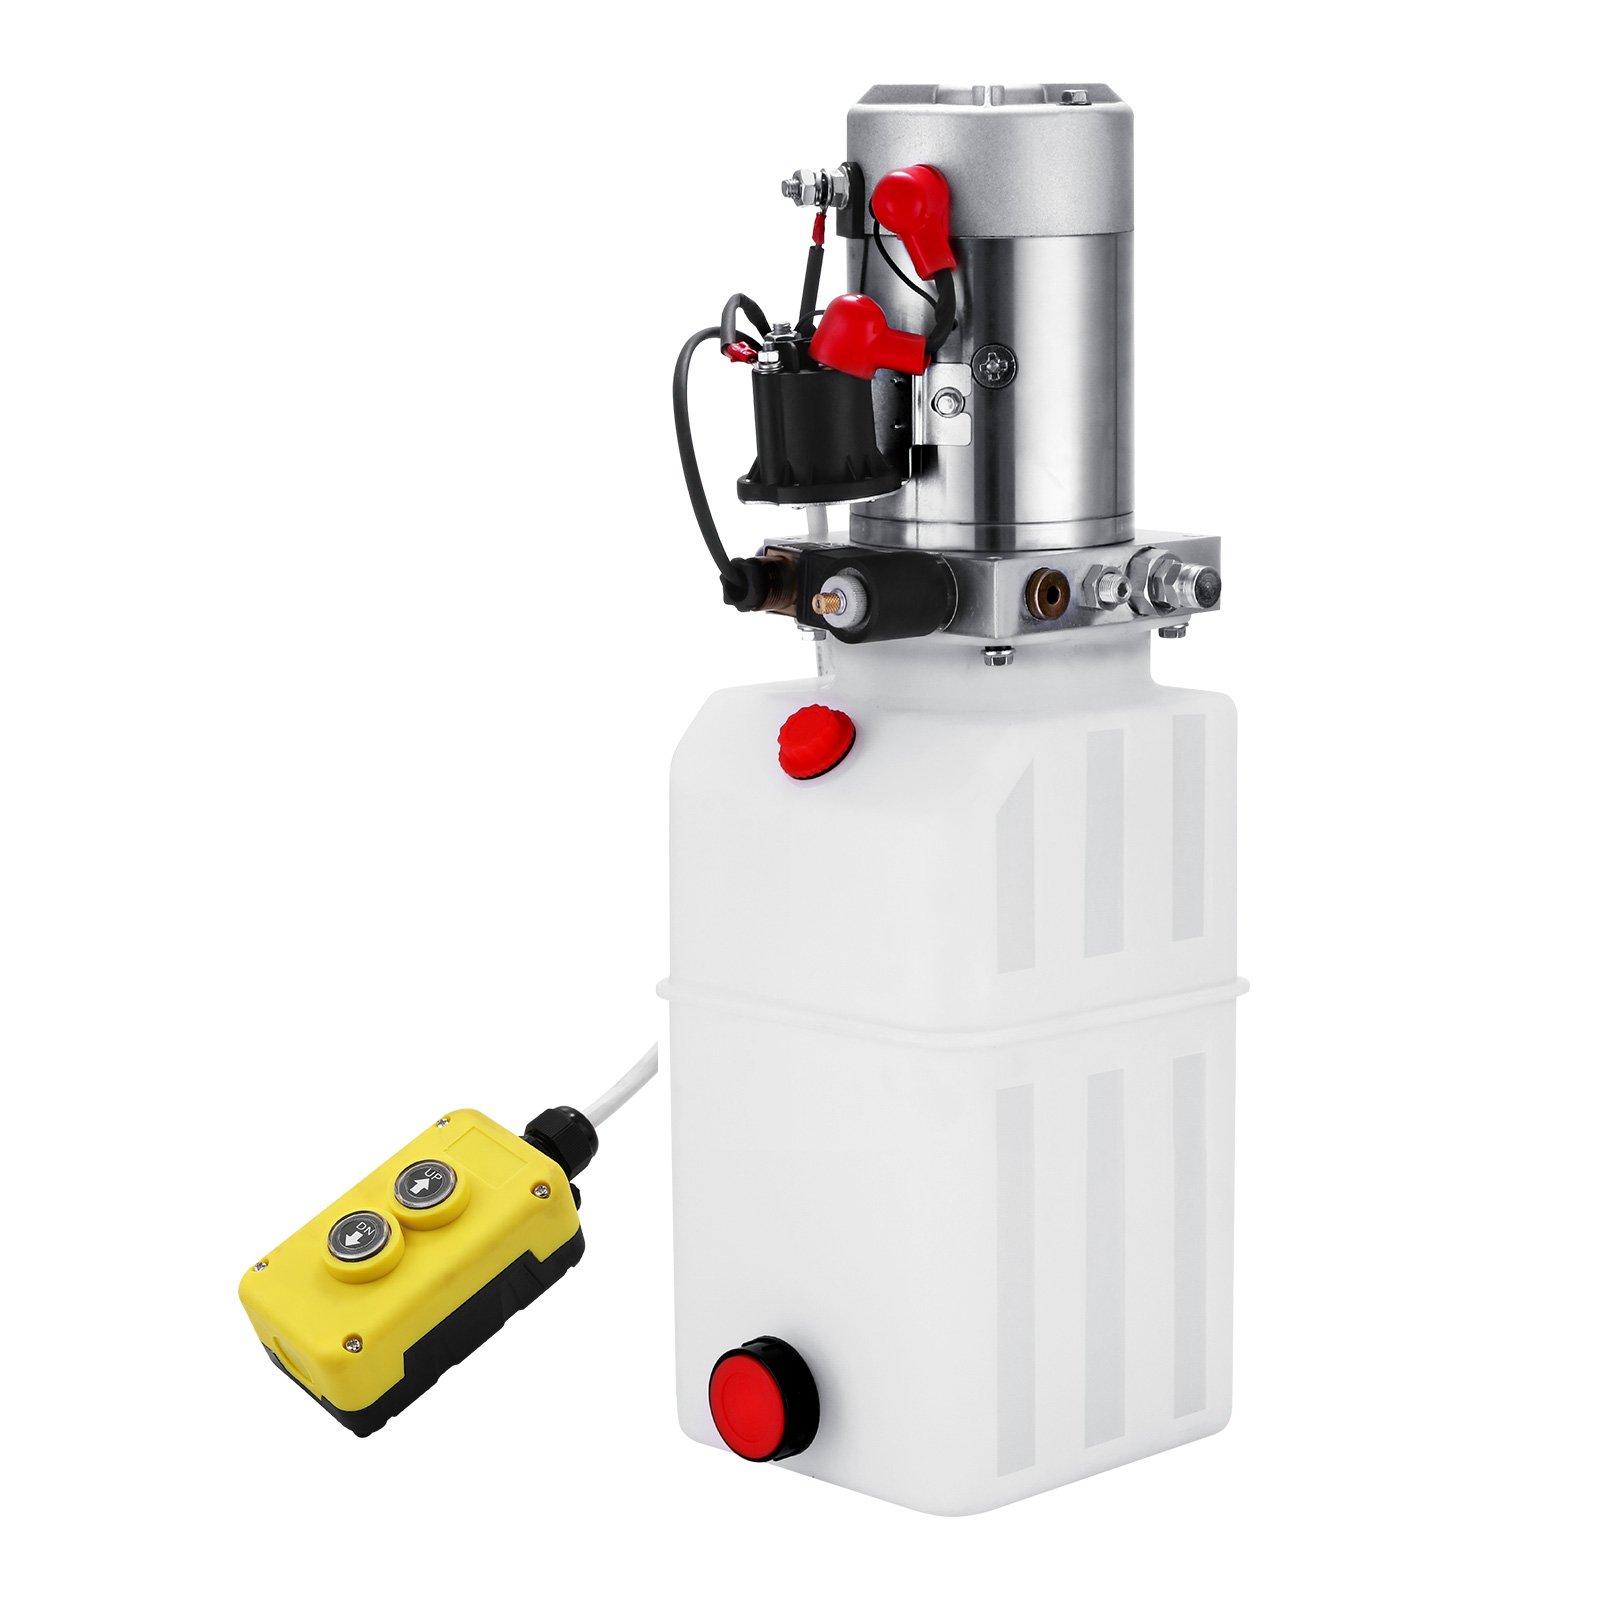 Happybuy Hydraulic Pump 12V DC Single Acting Hydraulic Power Unit 8 Quart Plastic Tank Hydraulic Pump Power Unit for Dump Trailer Car Lifting (8 Quart Single Acting Plastic)